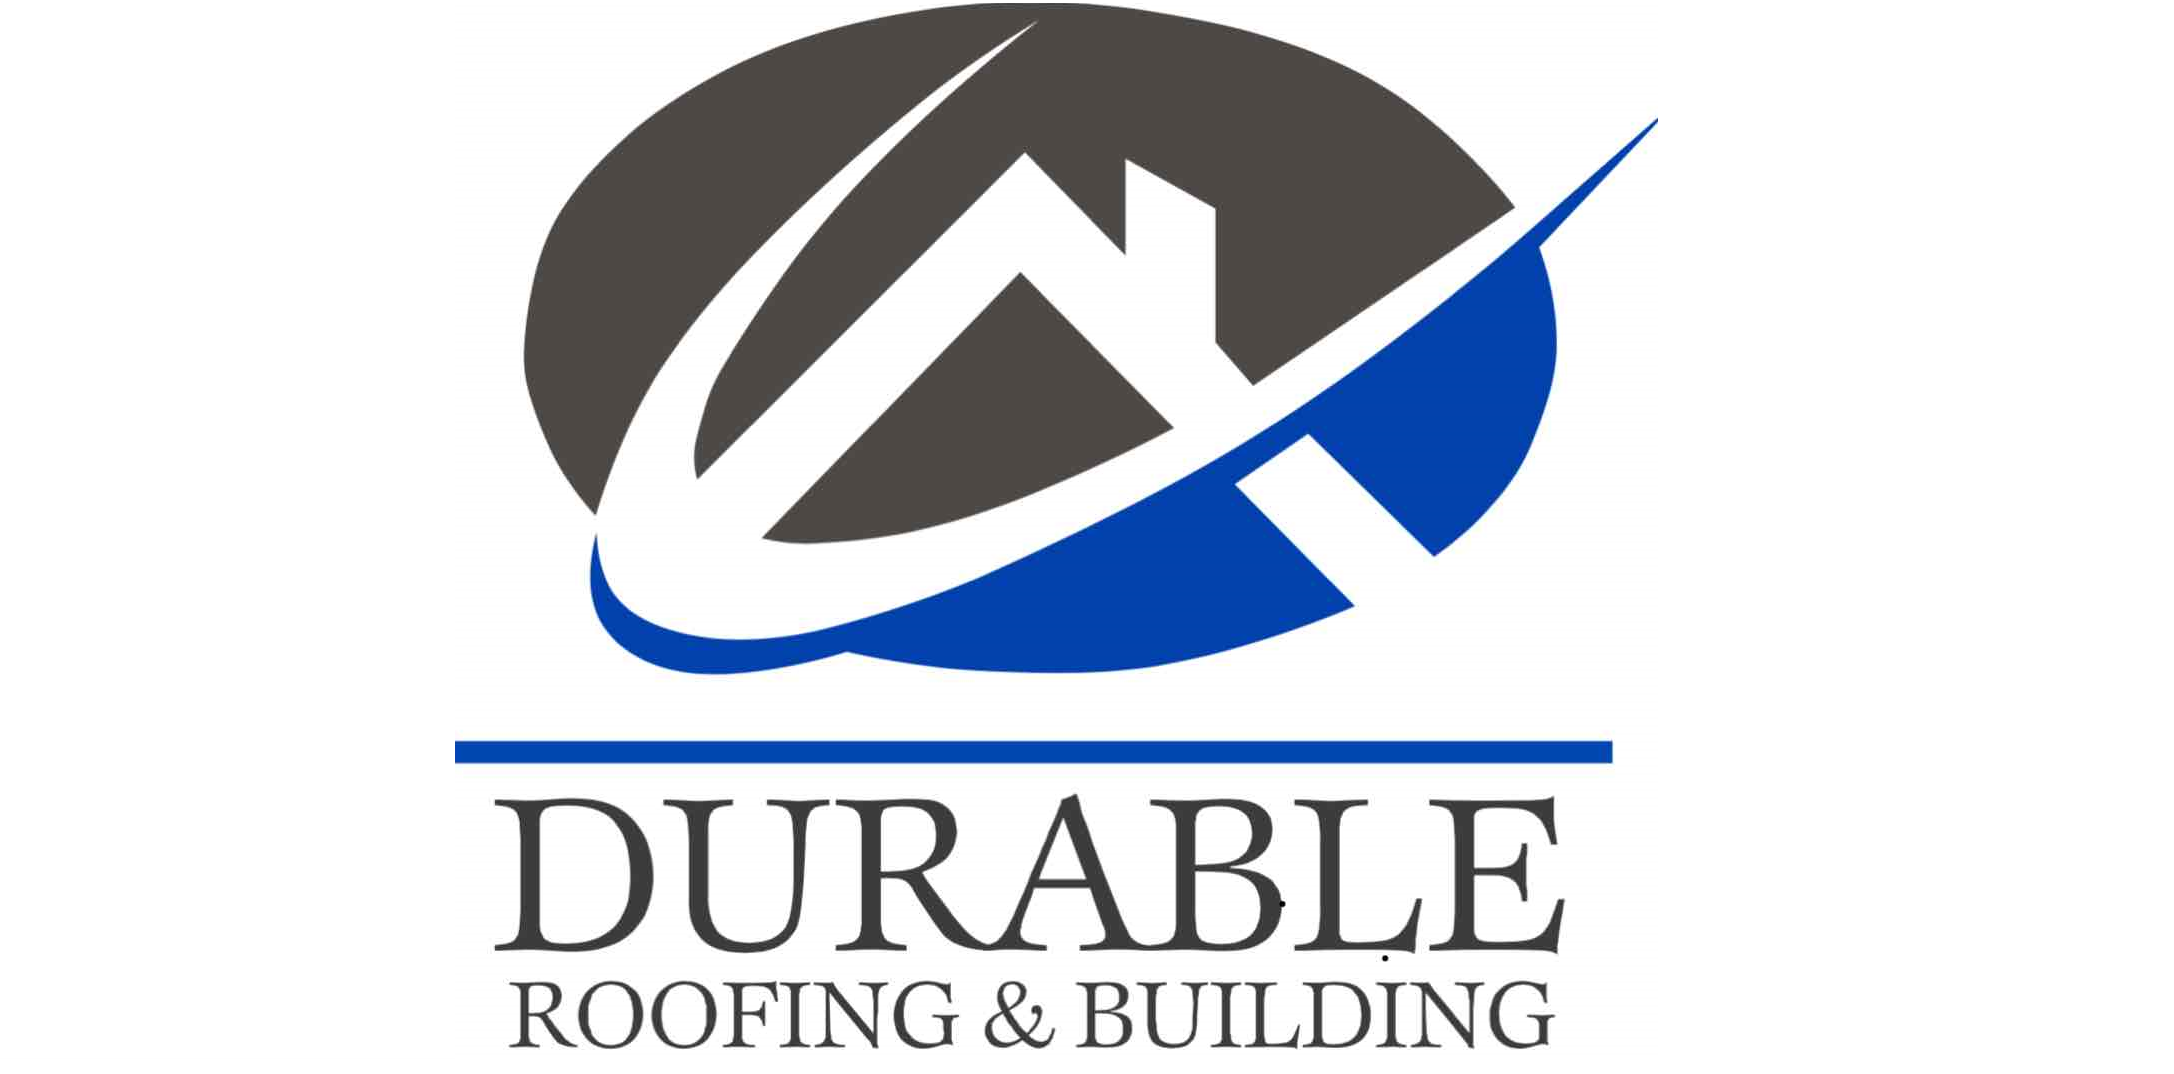 durable roofing northampton logo